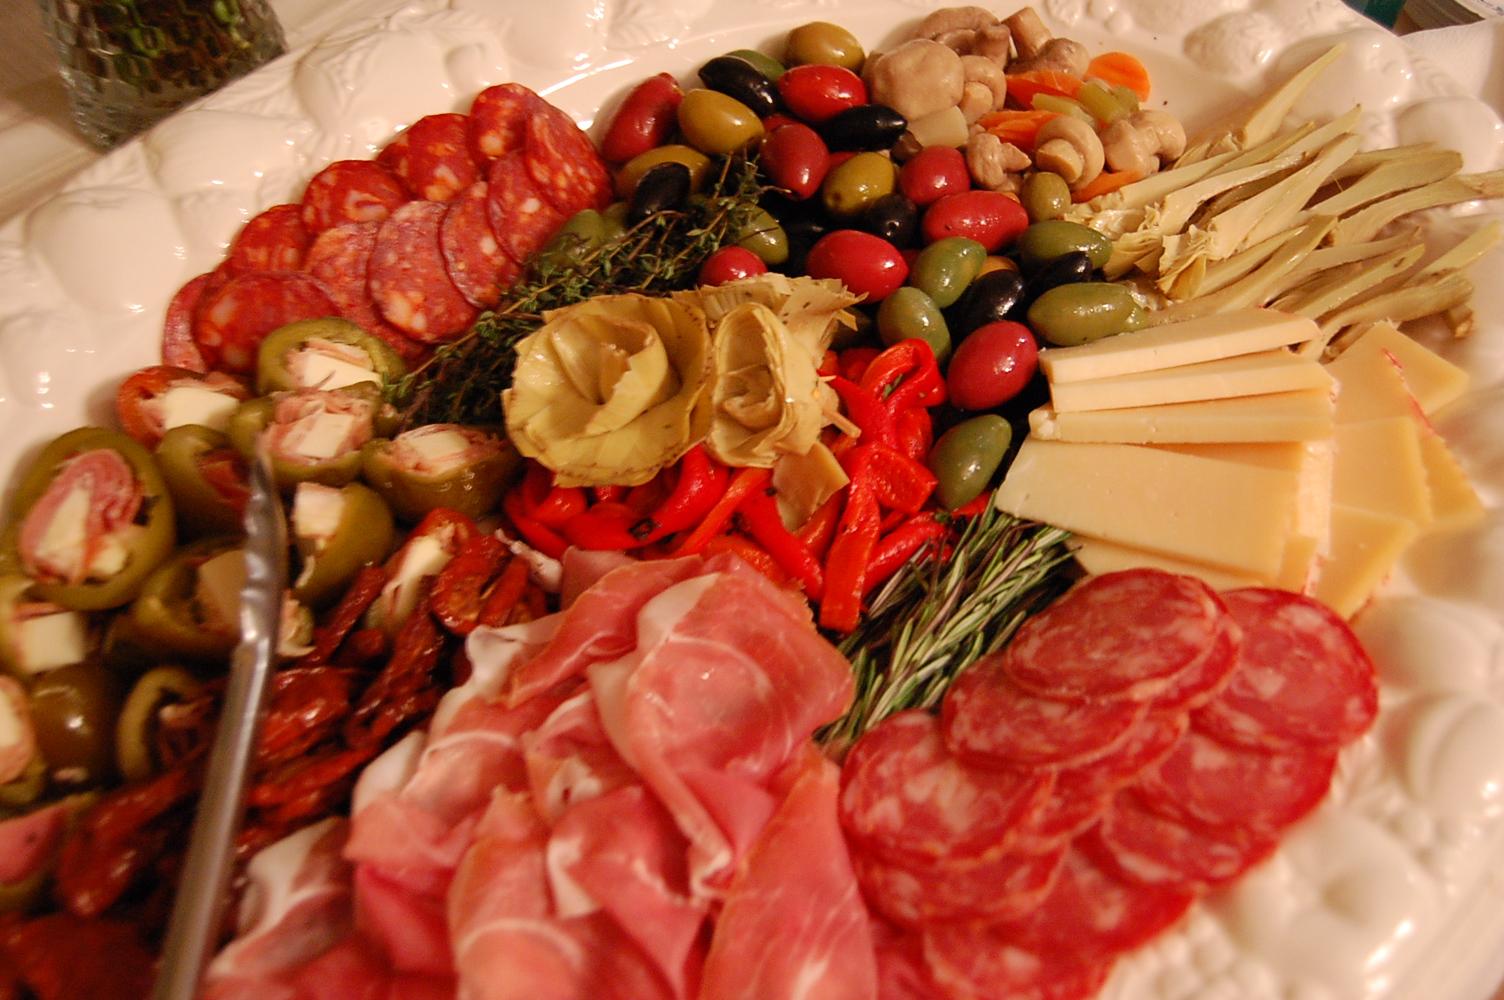 Italian Antipasto Platter Drawing Free Image